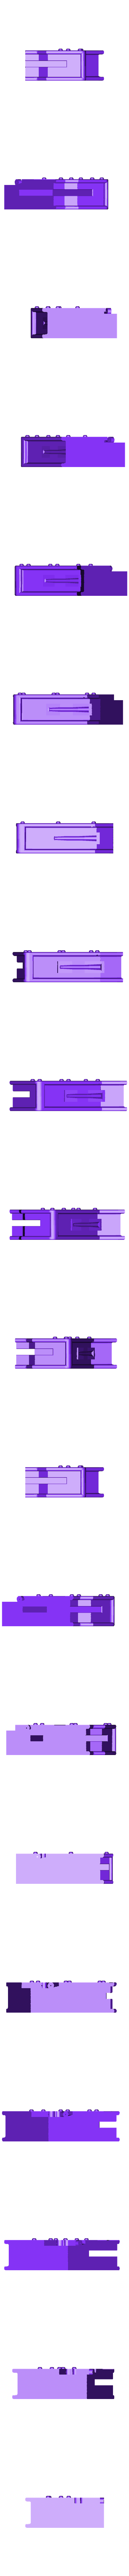 main_body_part_4.stl Download free STL file ORCA communicator (Godzilla) • 3D printing object, poblocki1982